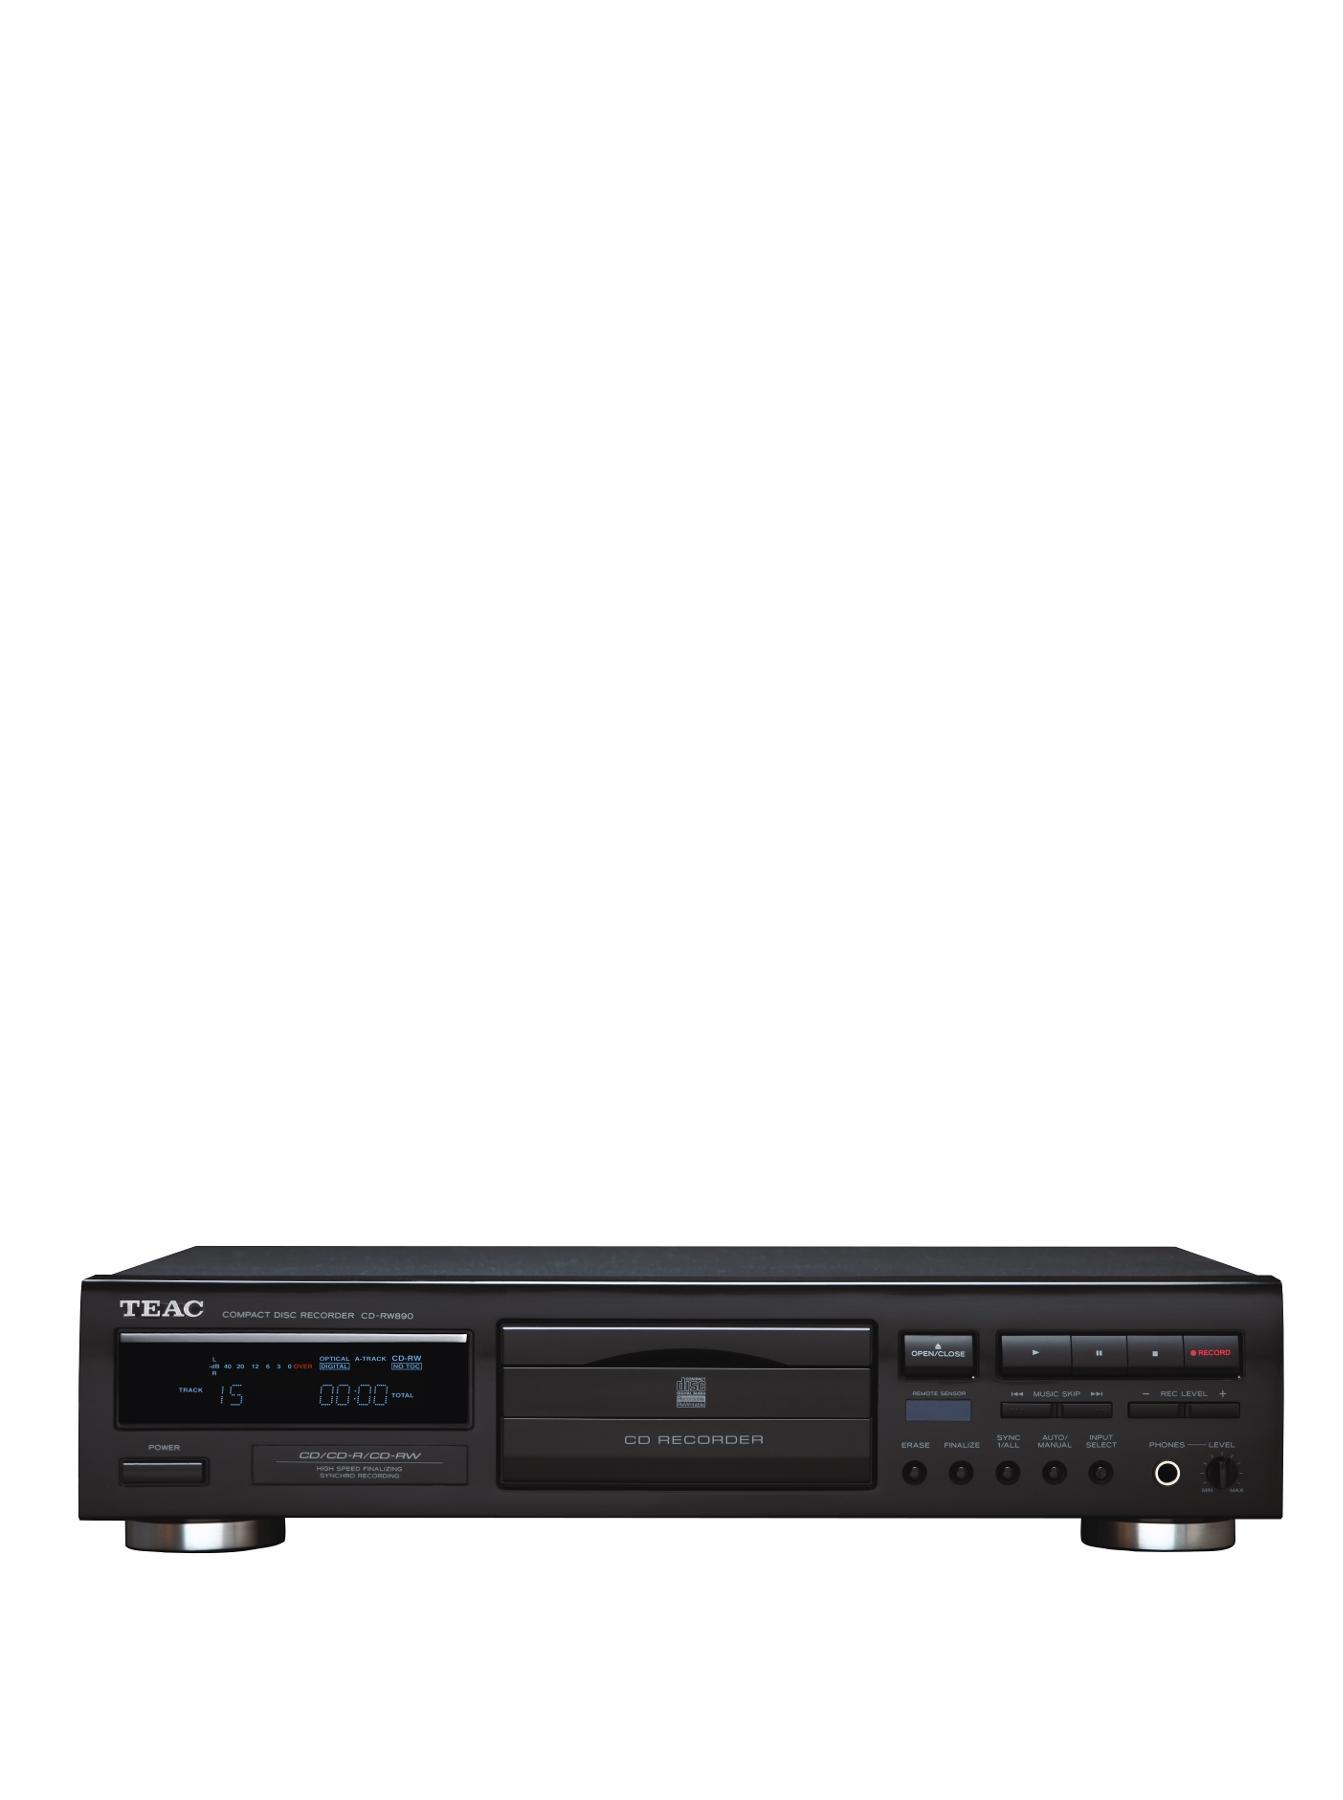 Teac CD-RW890 CD Recorder